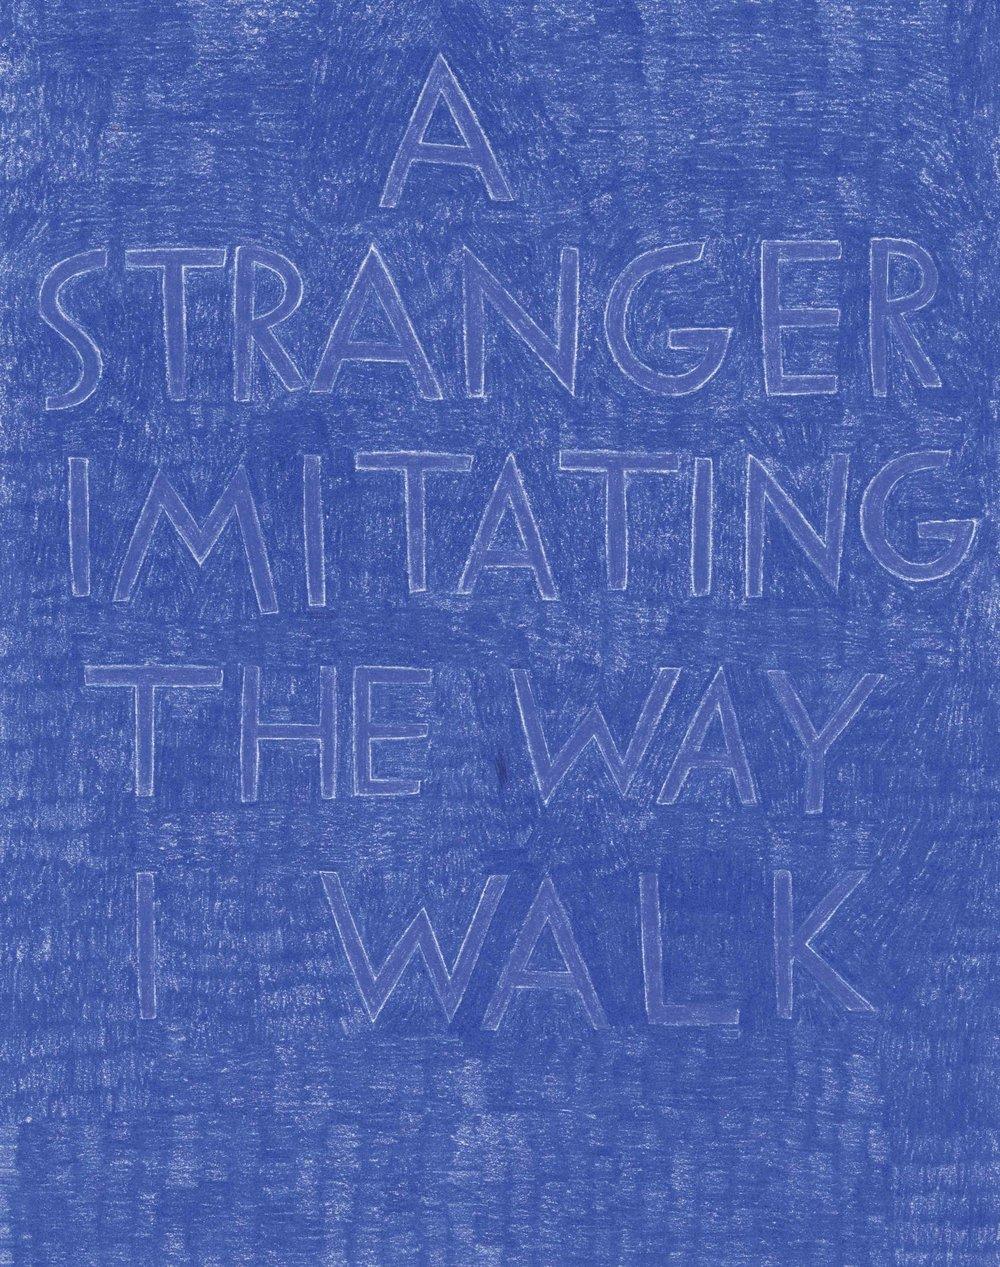 """A stranger imitating the way I walk,"" in dark blue on dark blue."